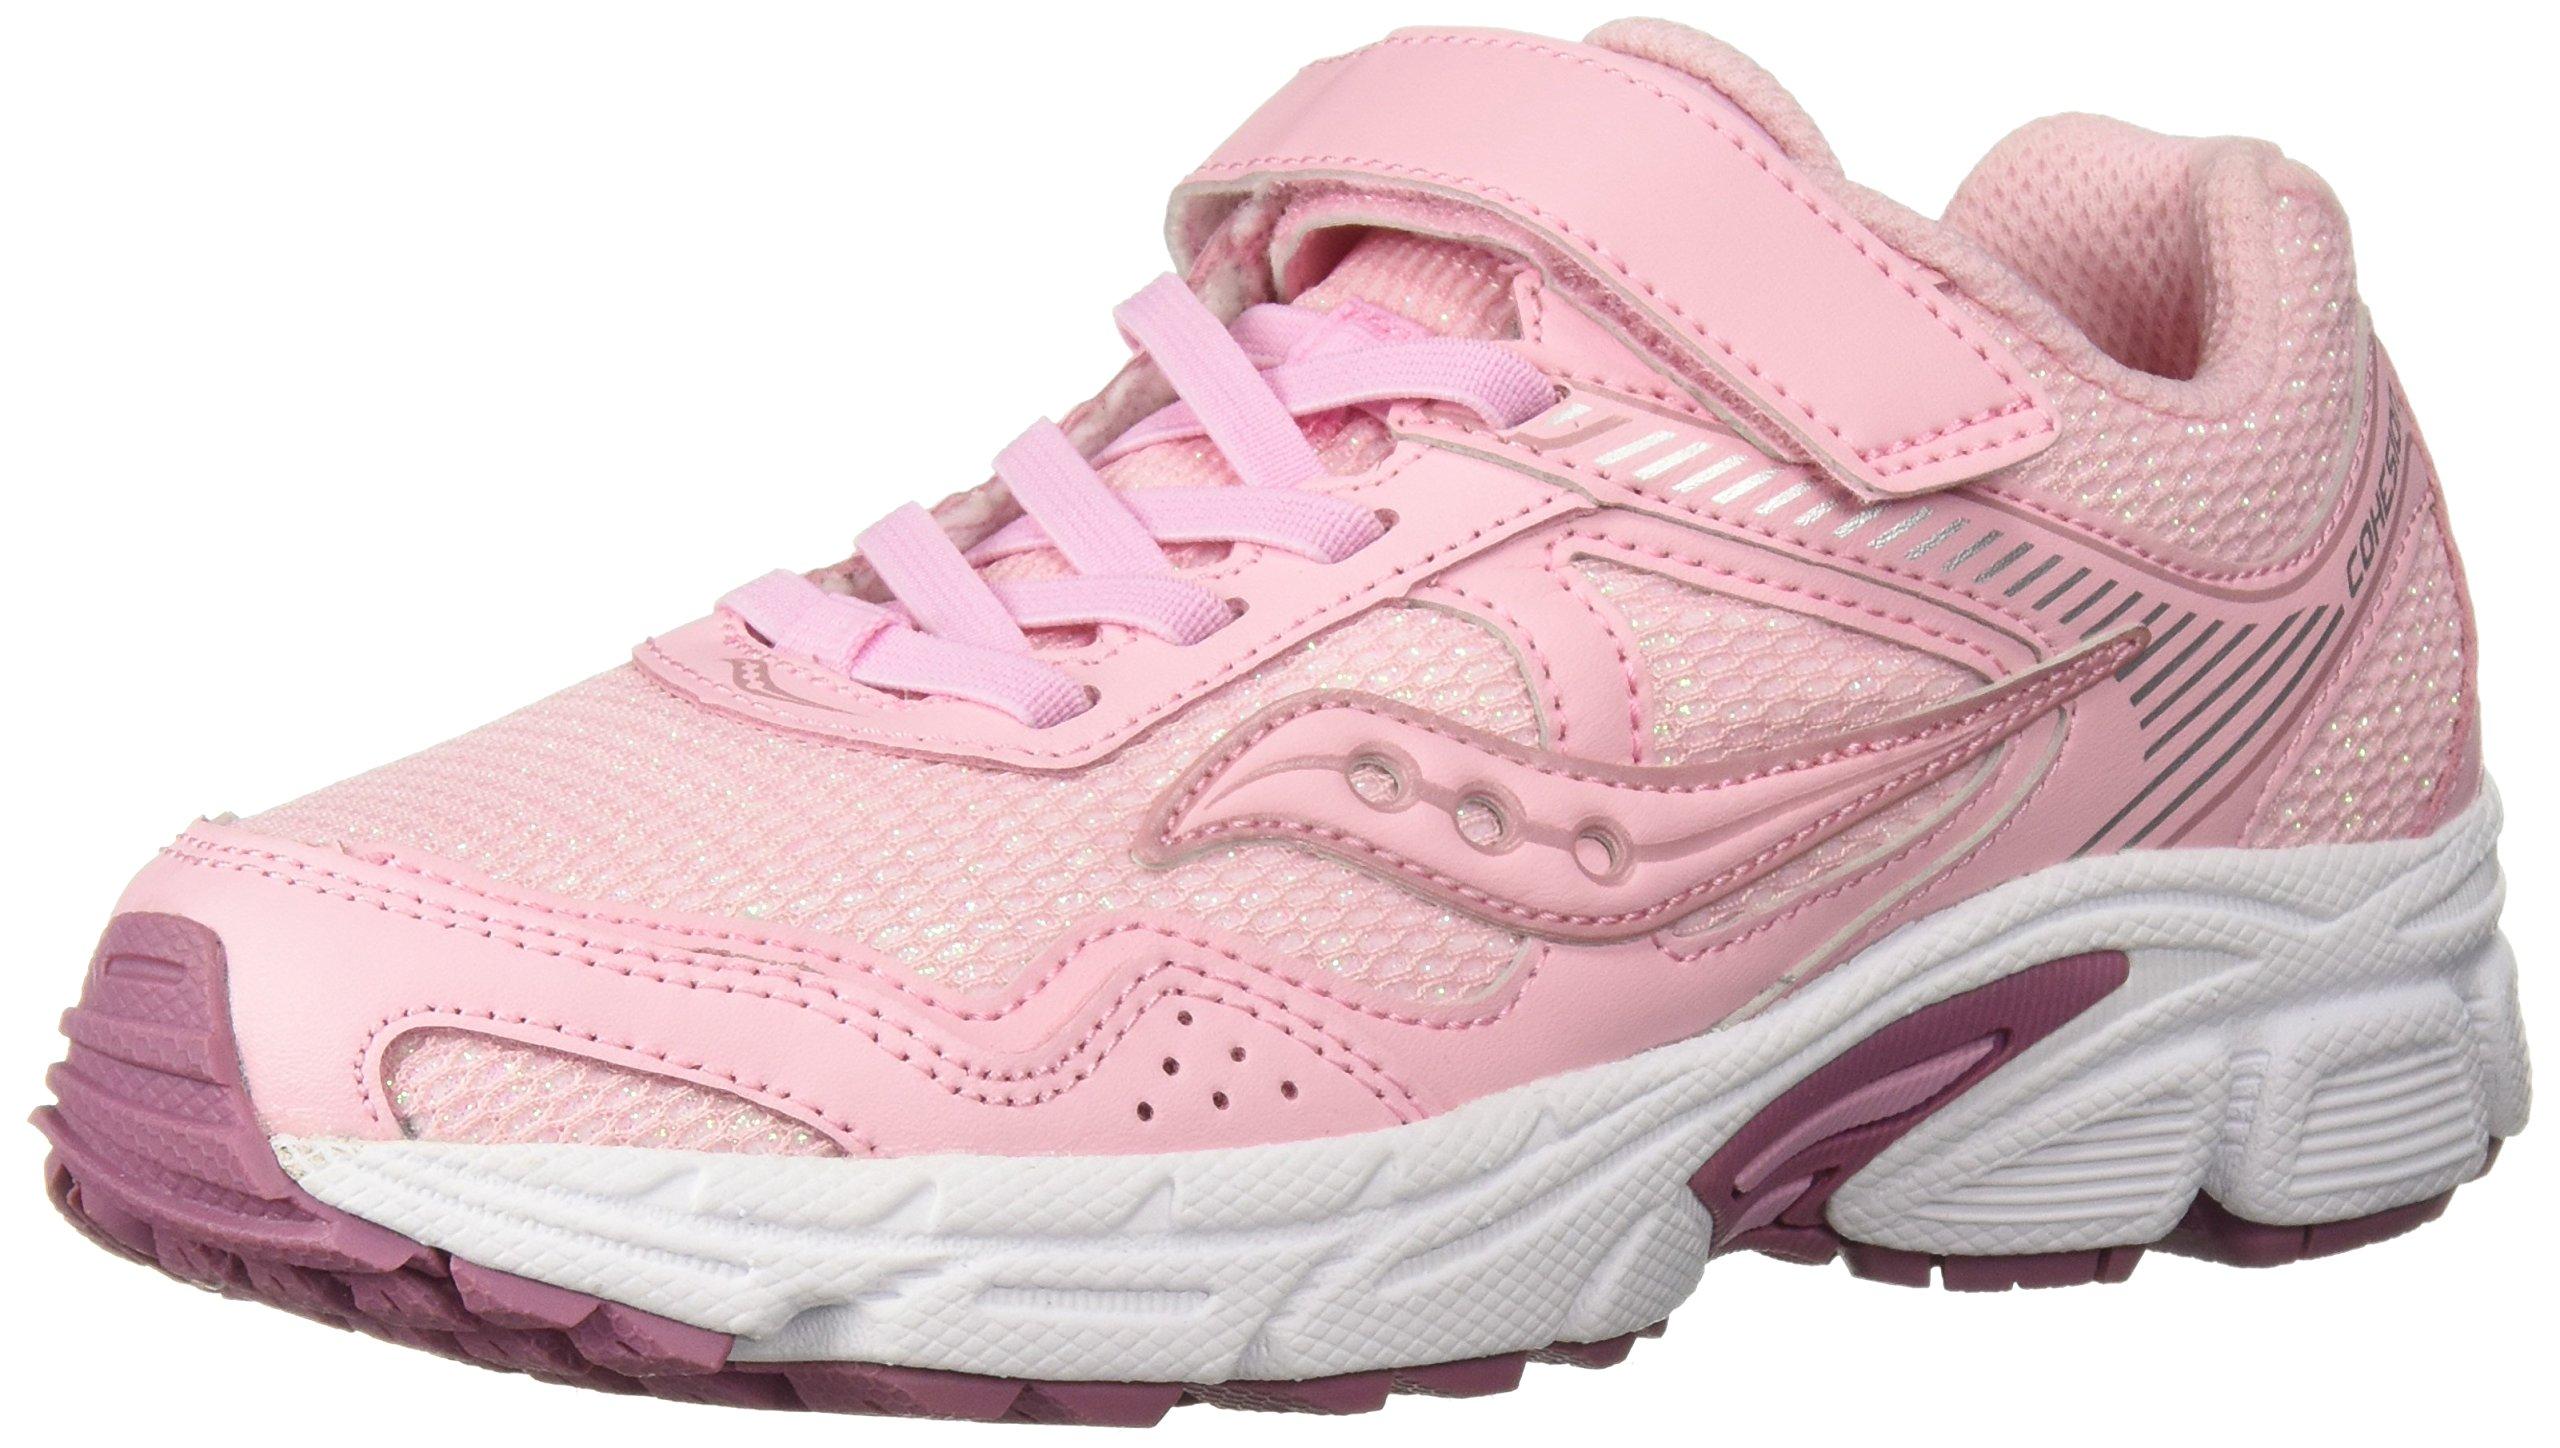 77a26c1e Saucony Girls' Cohesion 10 A/C Sneaker, Blush, 10.5 W US Little Kid